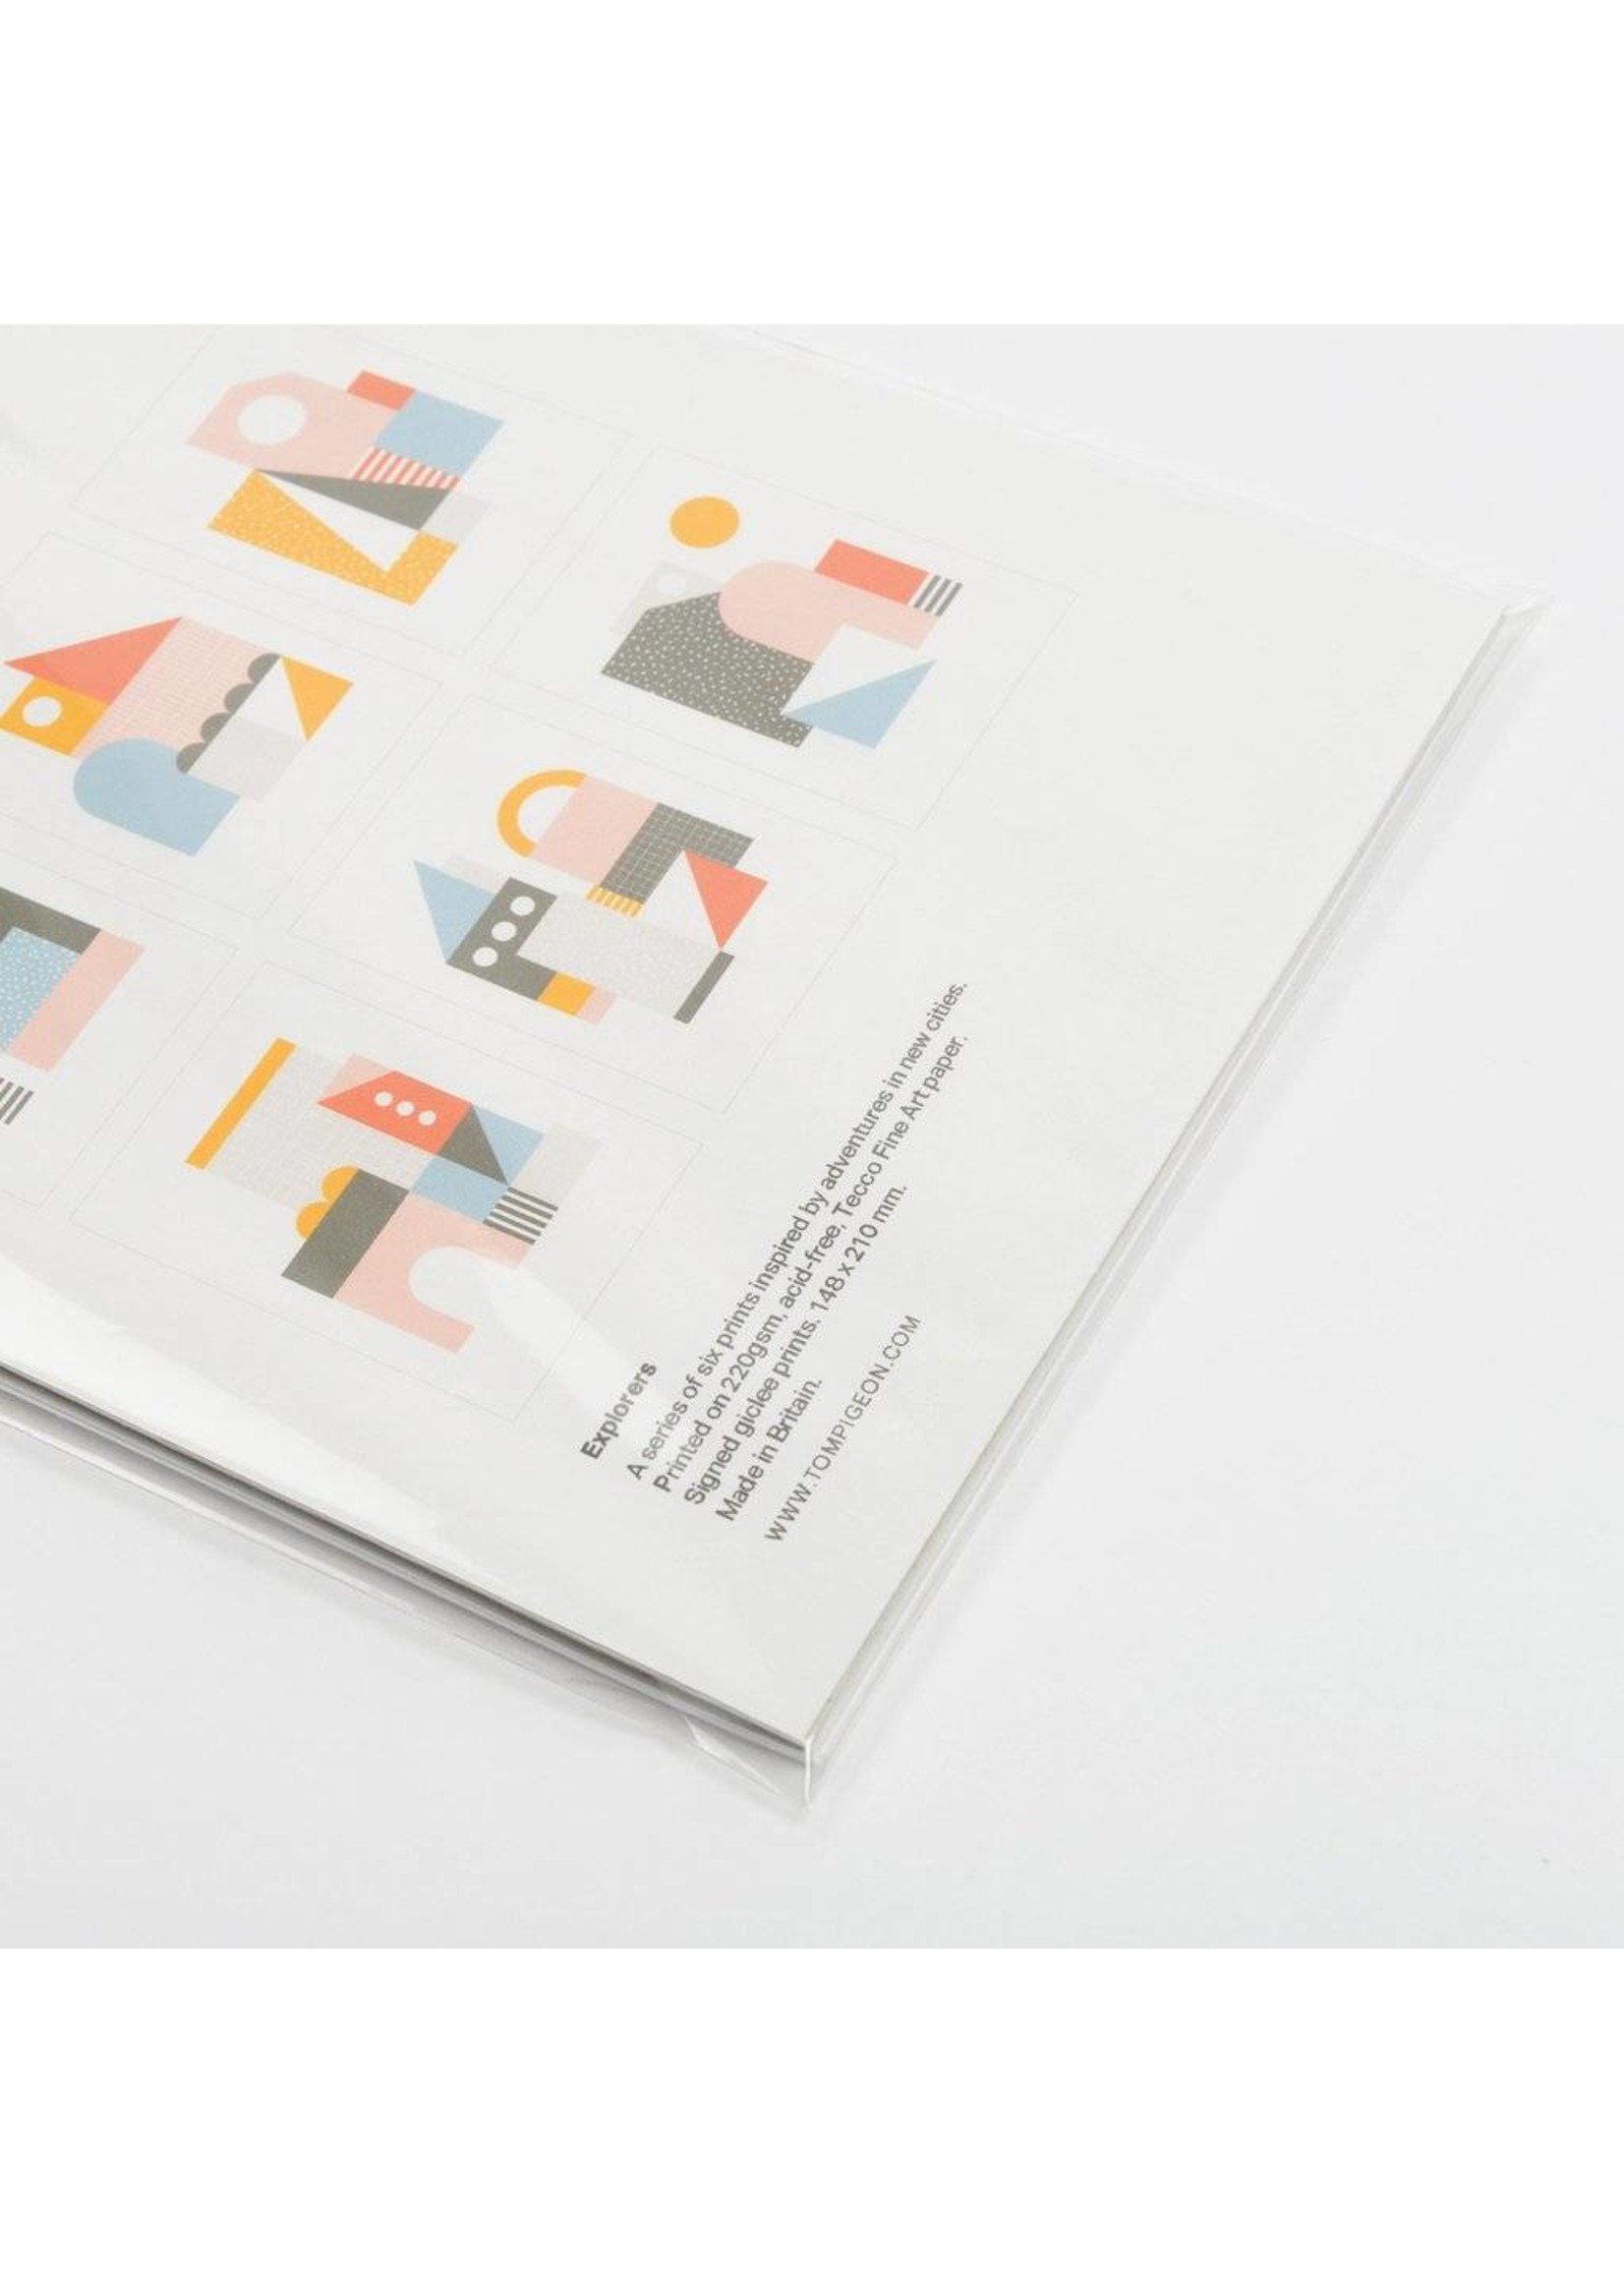 Tom Pigeon Tom Pigeon Explorers Set of Six A5 Prints